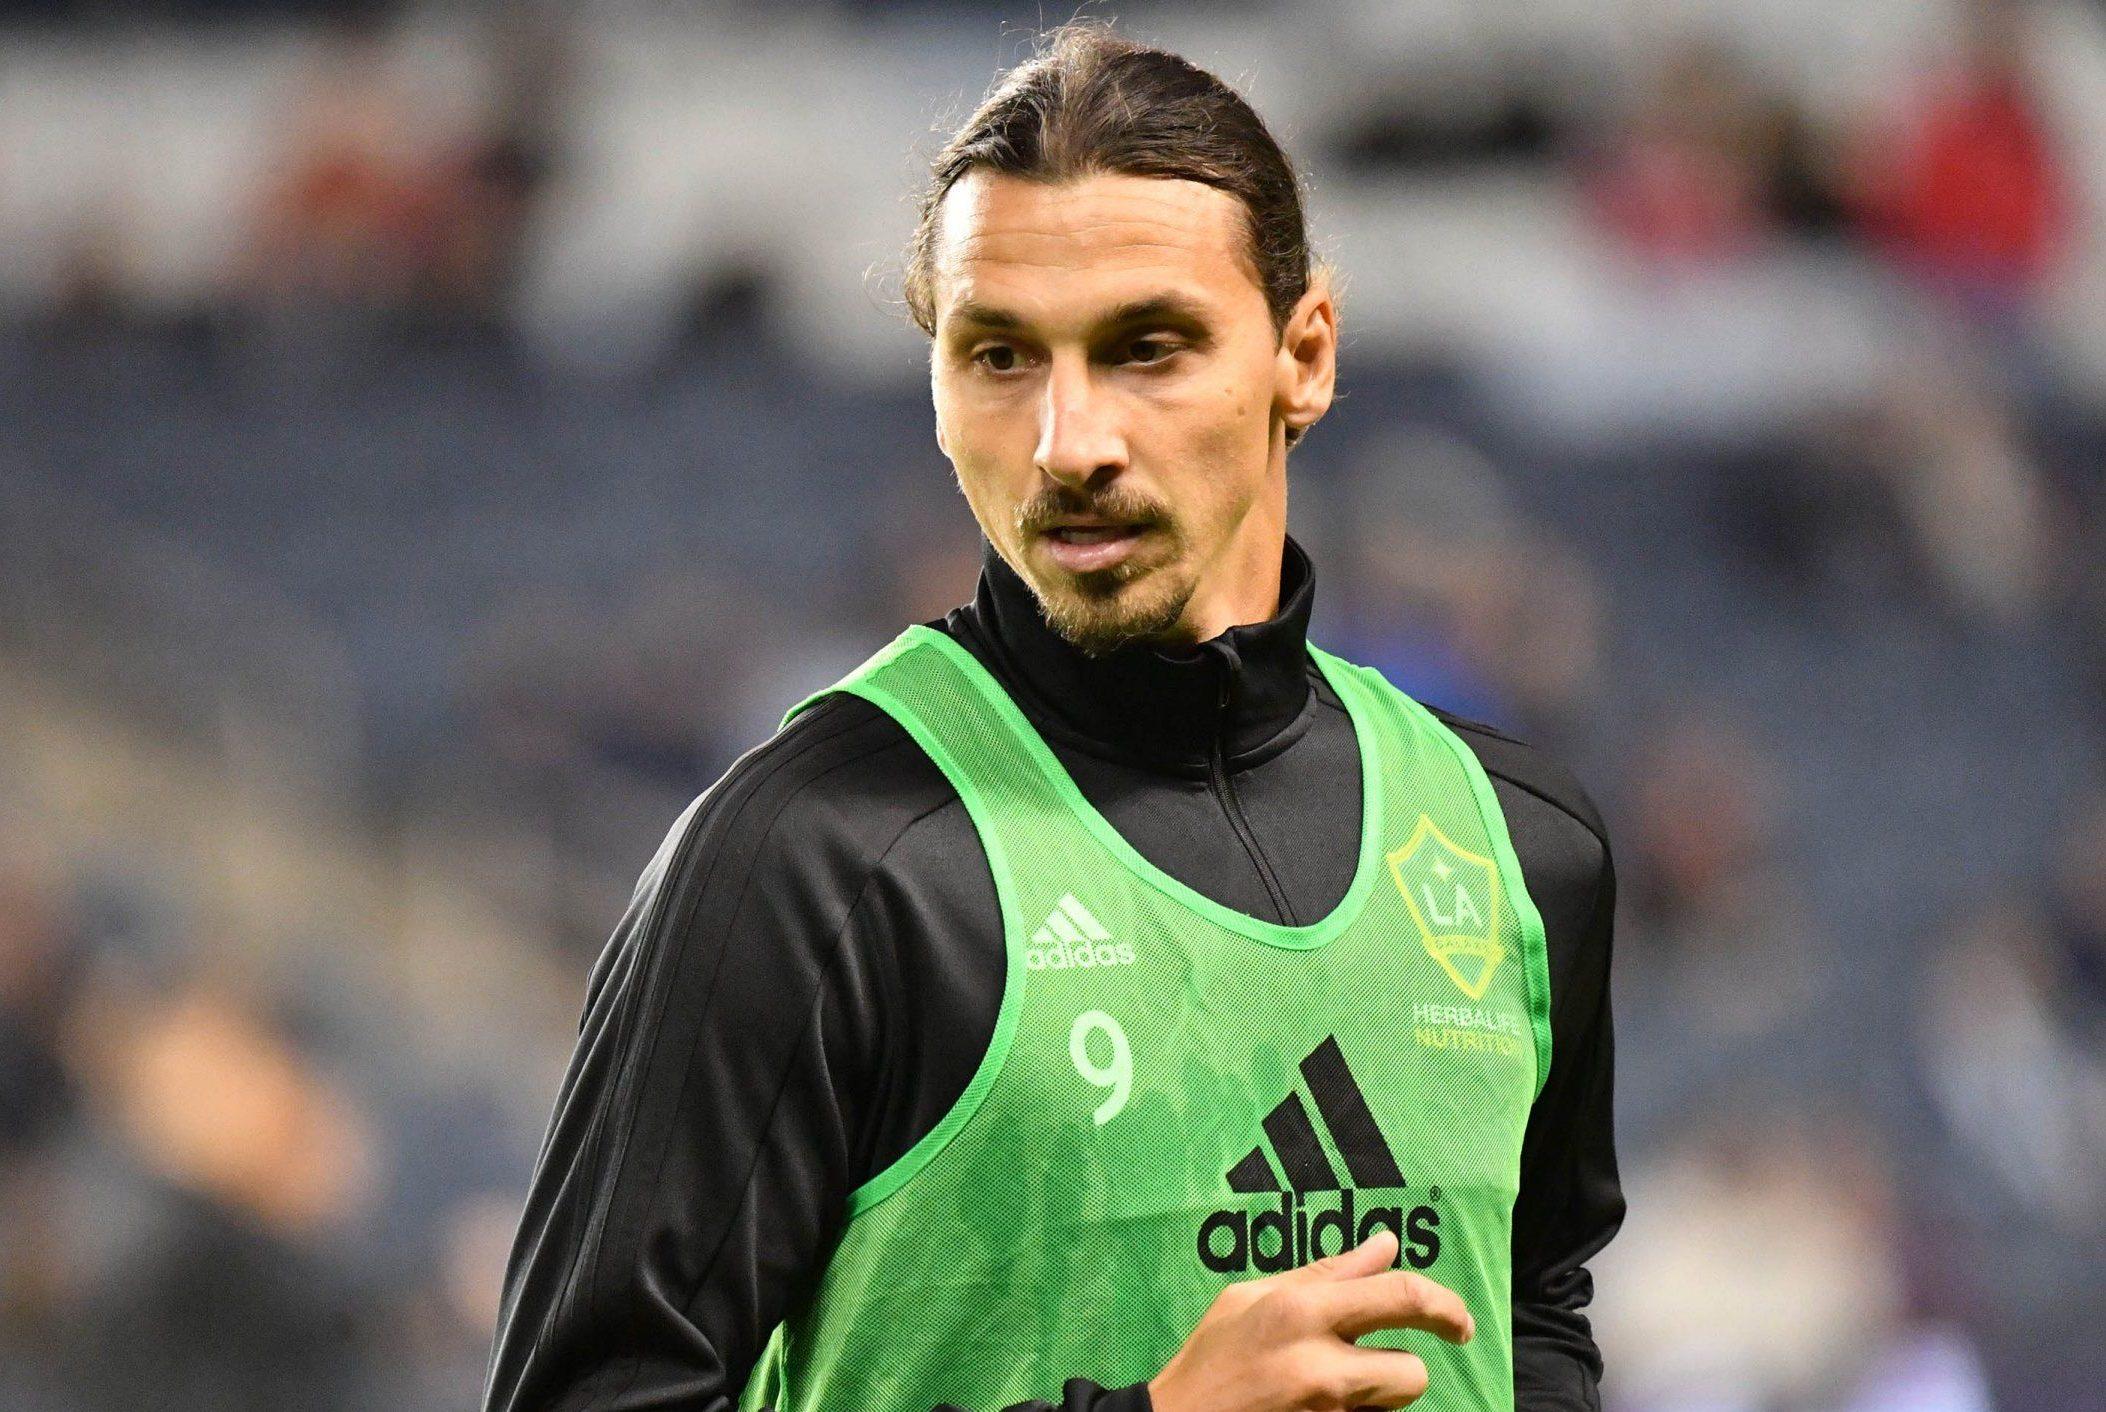 Jose Mourinho insists Zlatan Ibrahimovic will not return to Manchester United on loan